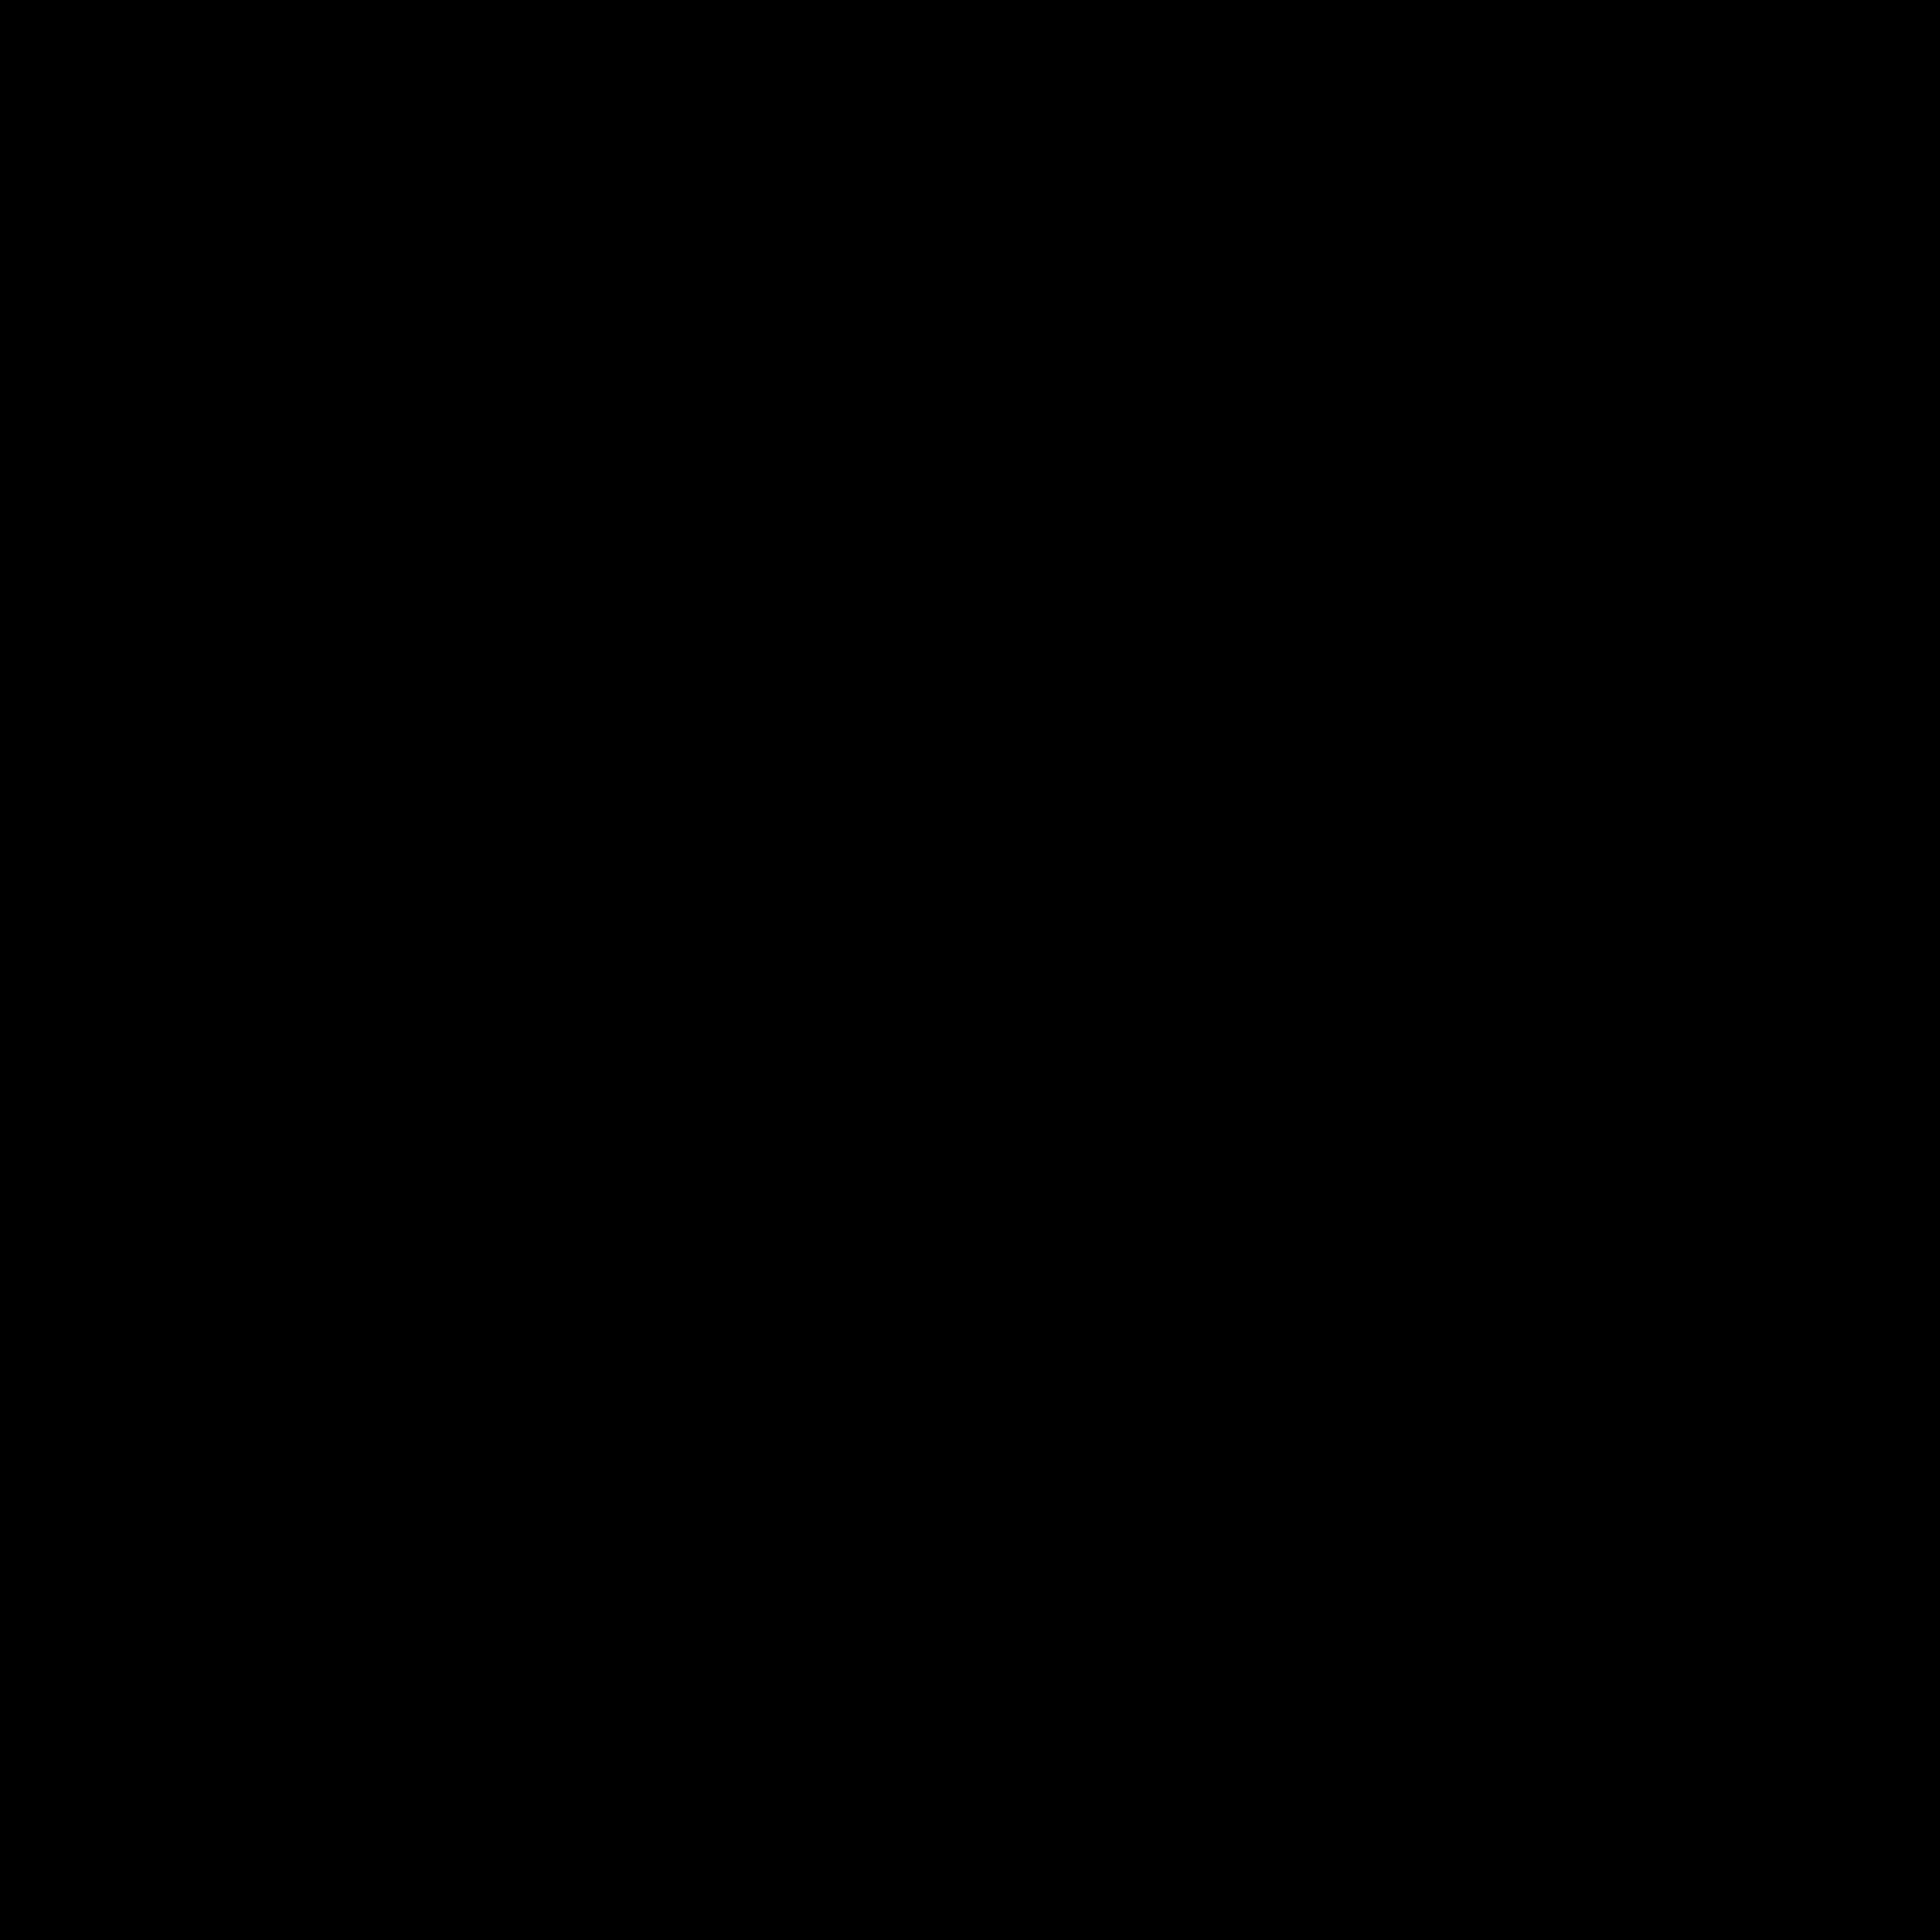 sheraton-hotels-resorts-2-logo-png-transparent.png